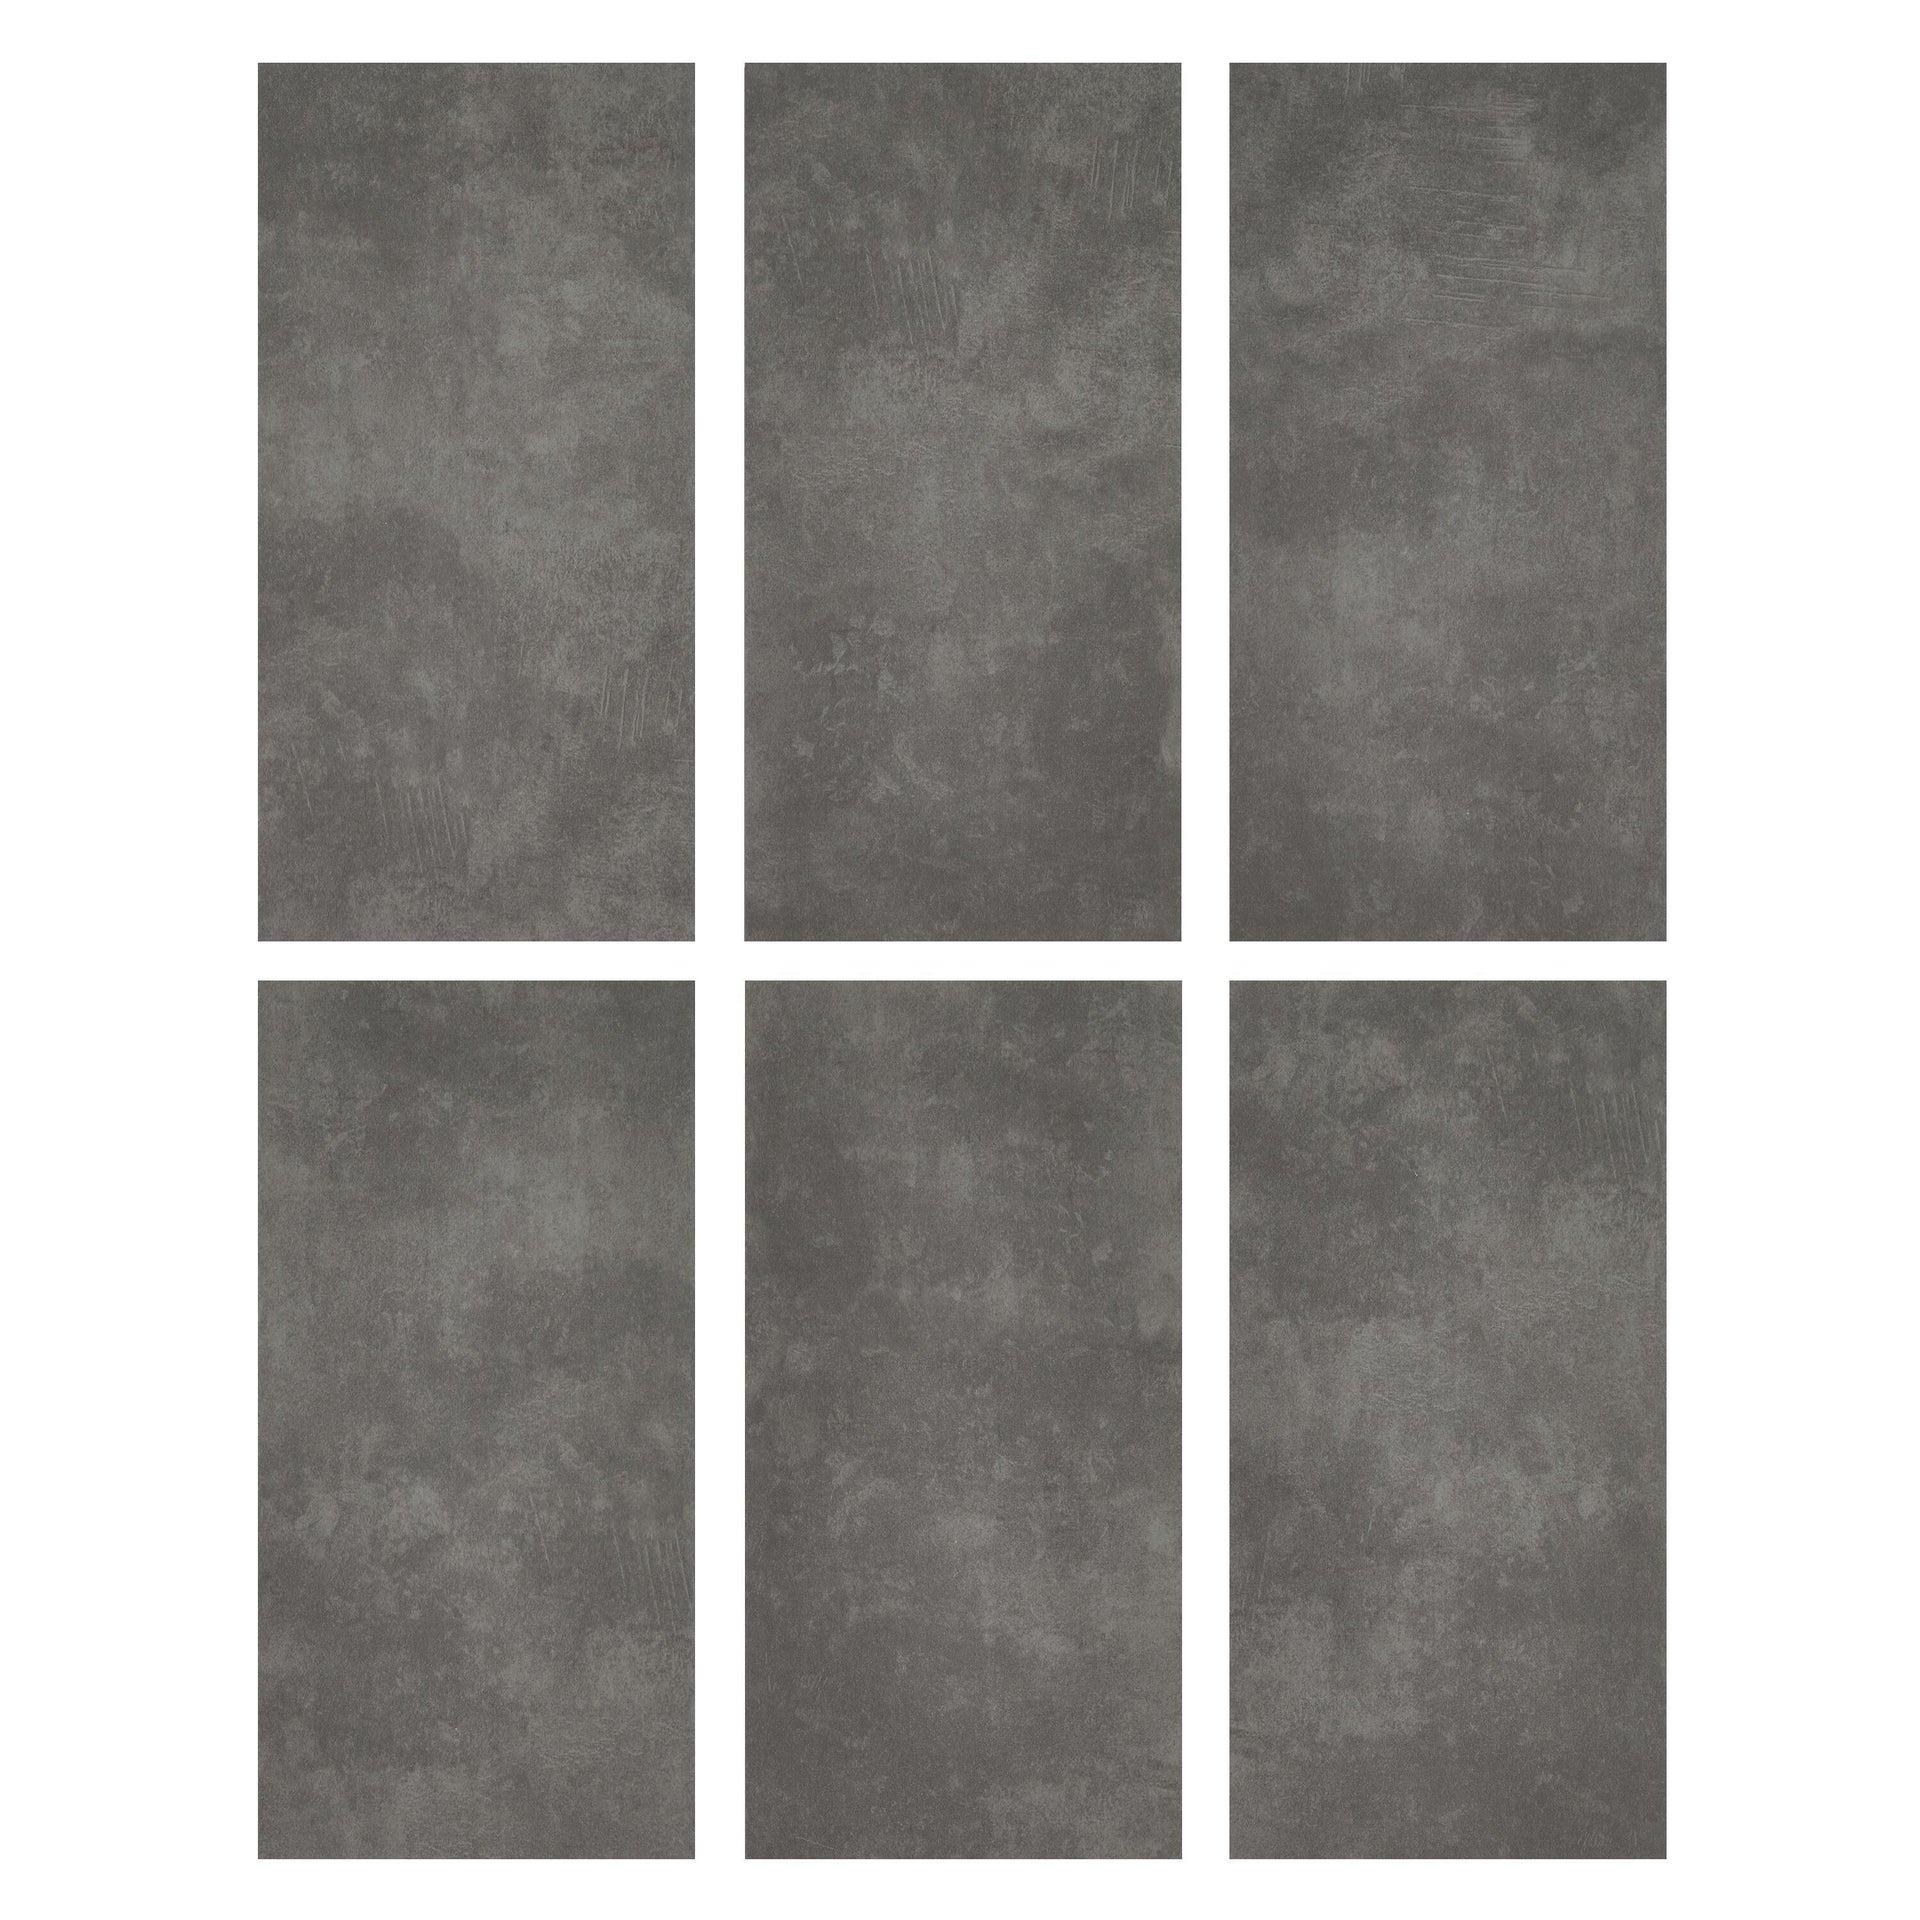 Pavimento PVC incastro Tolu Sp 4 mm grigio / argento - 2